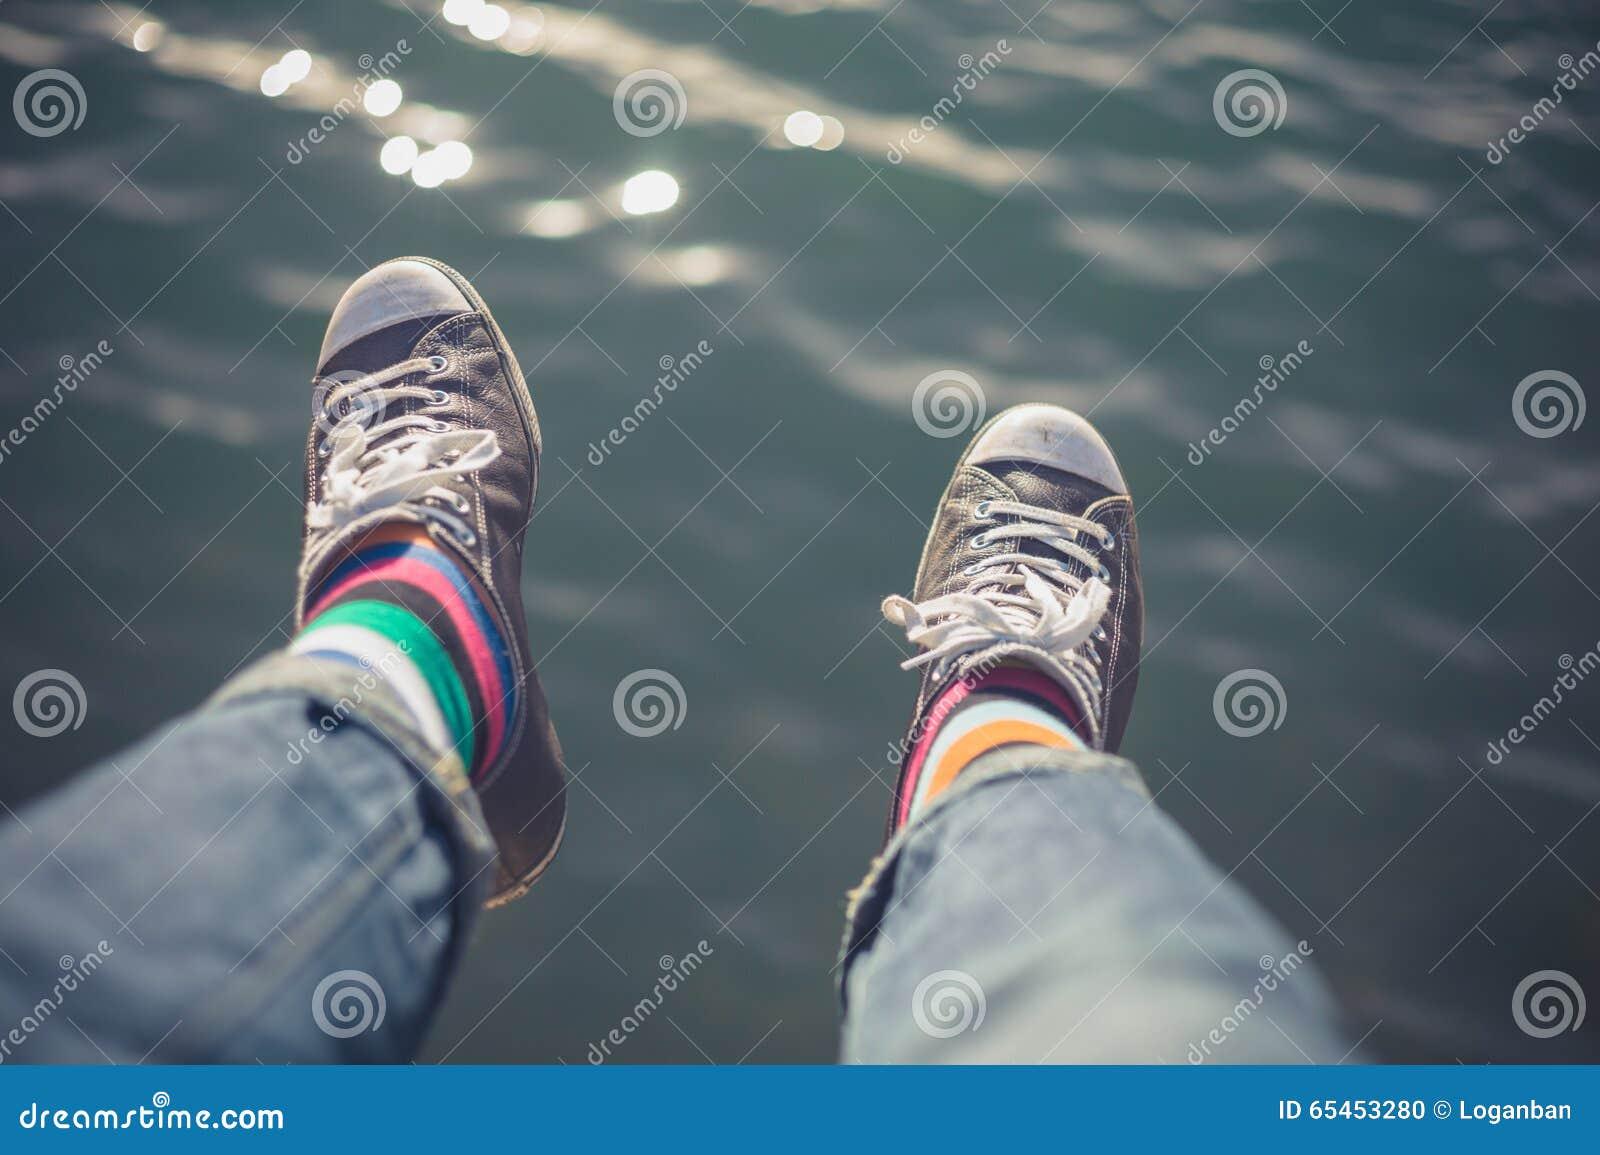 Man dangling feet over water